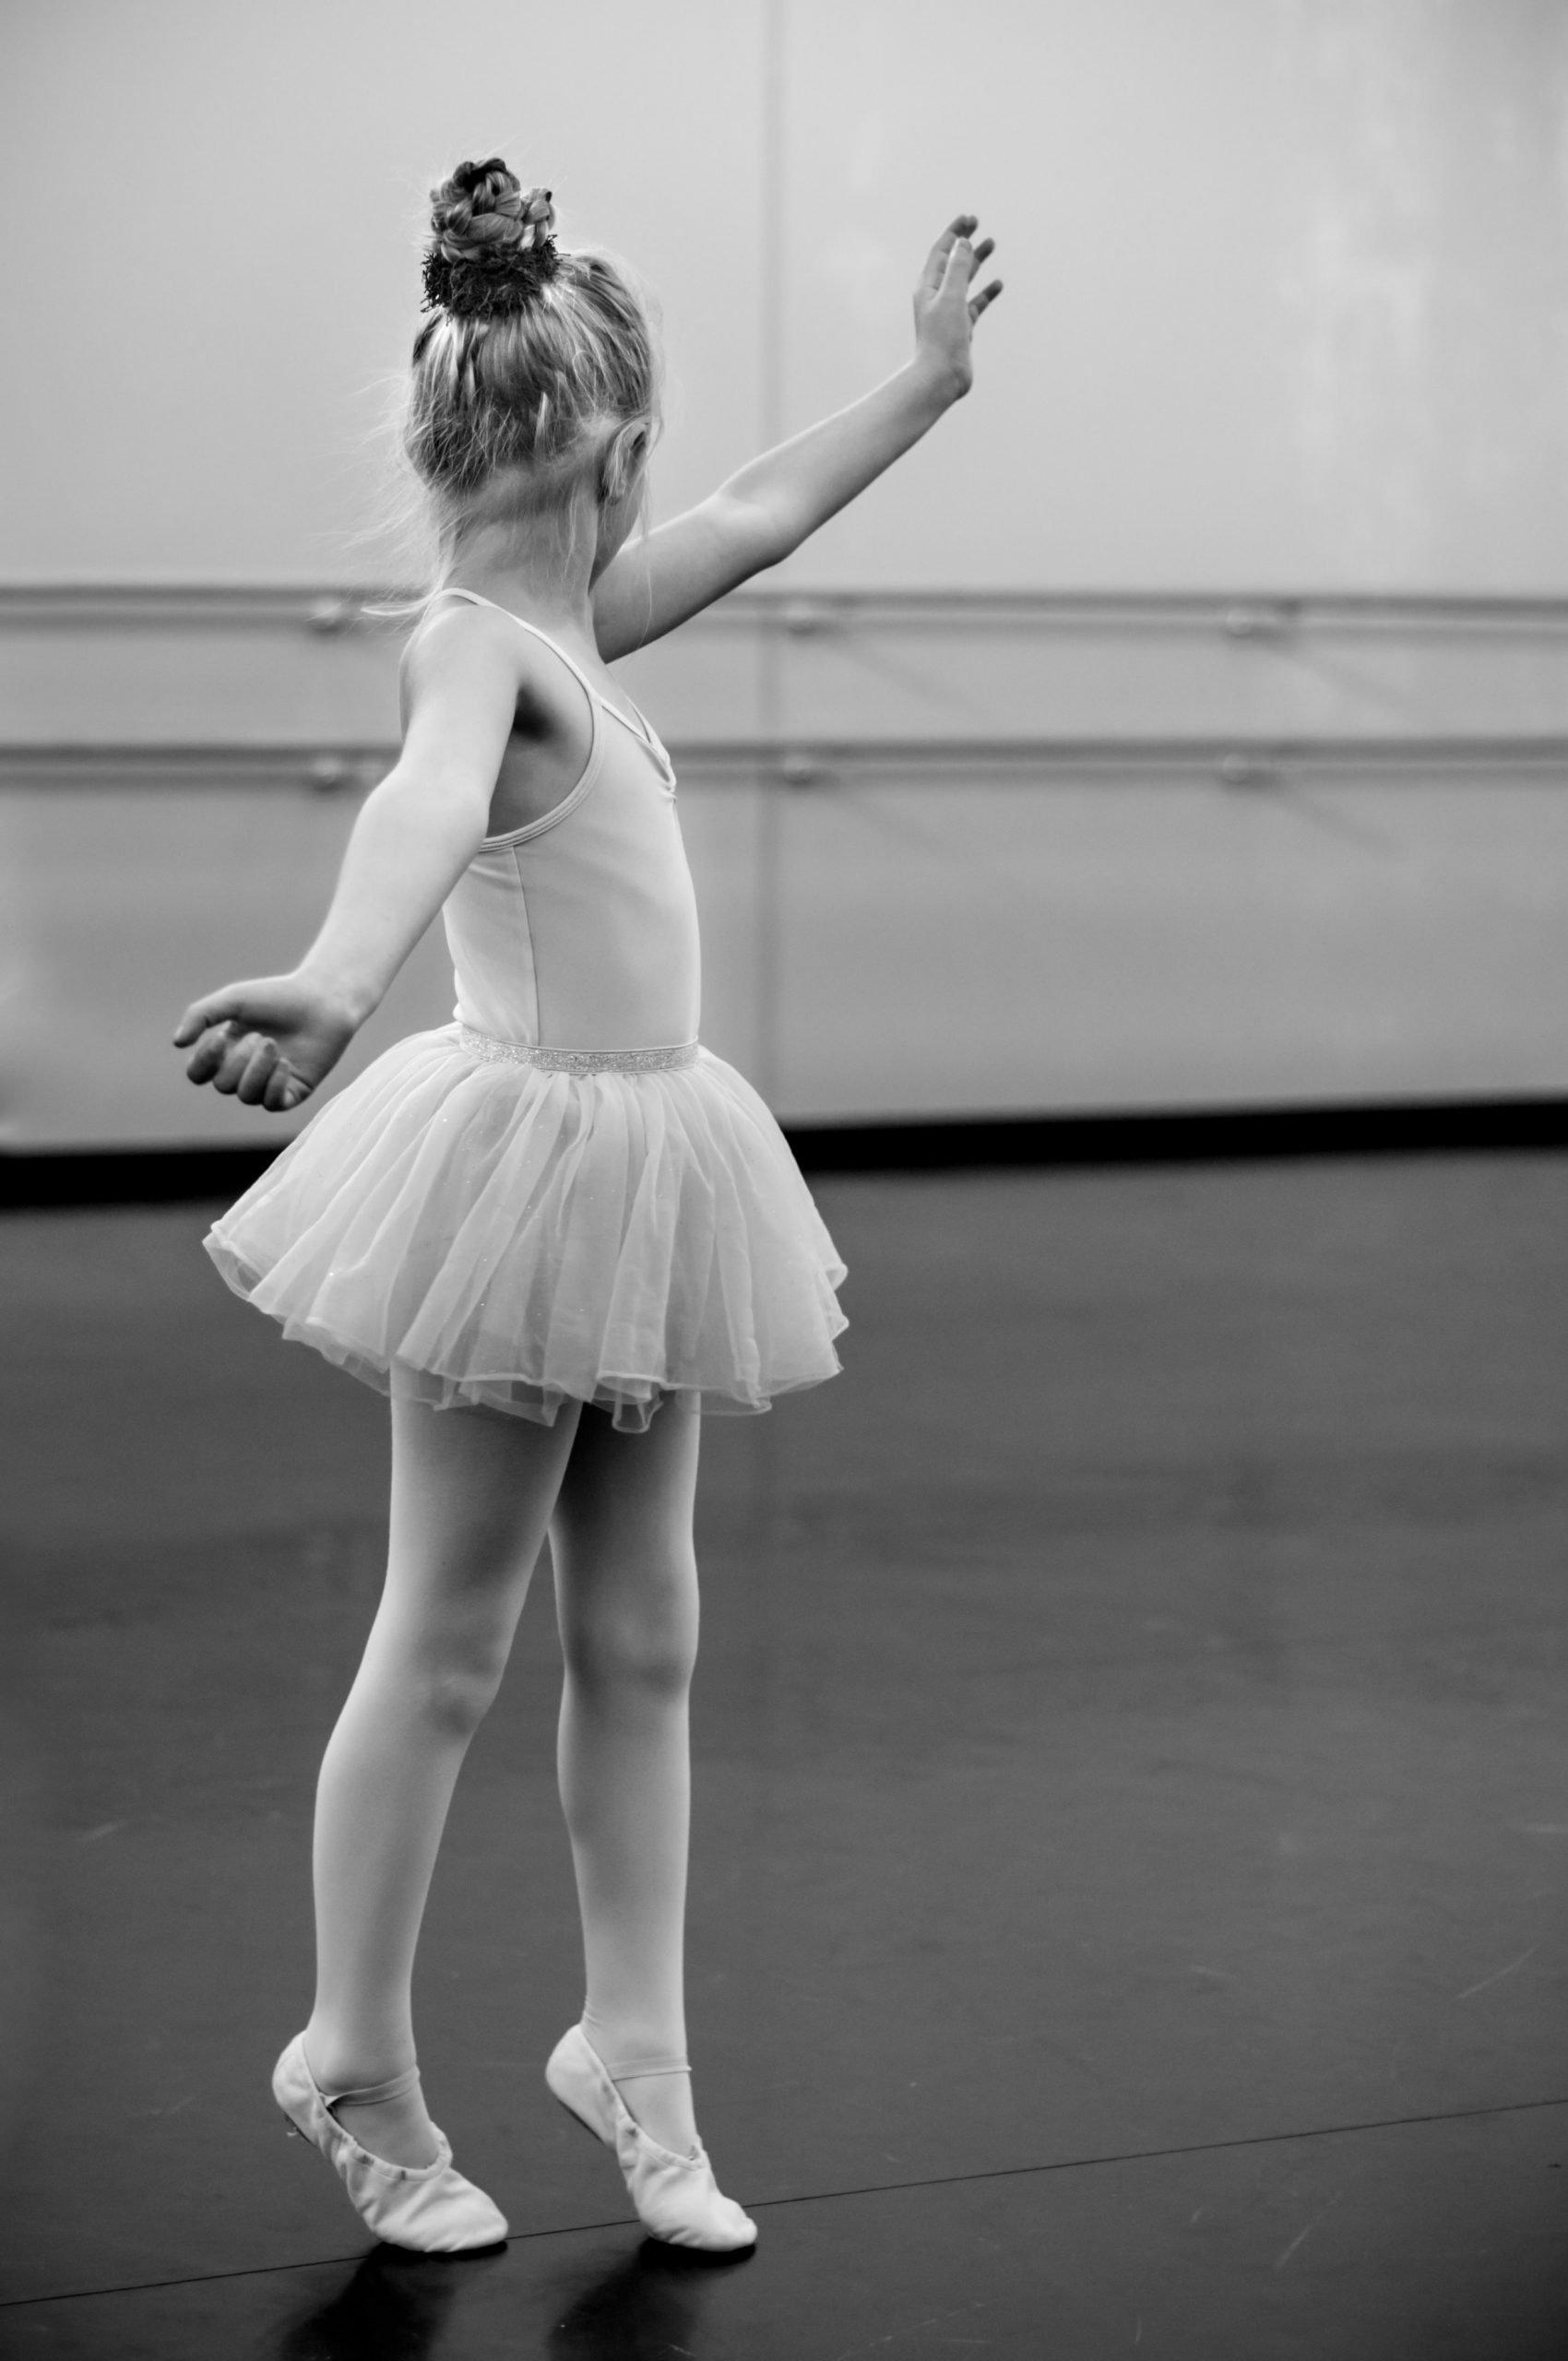 Movement and Gymnastics